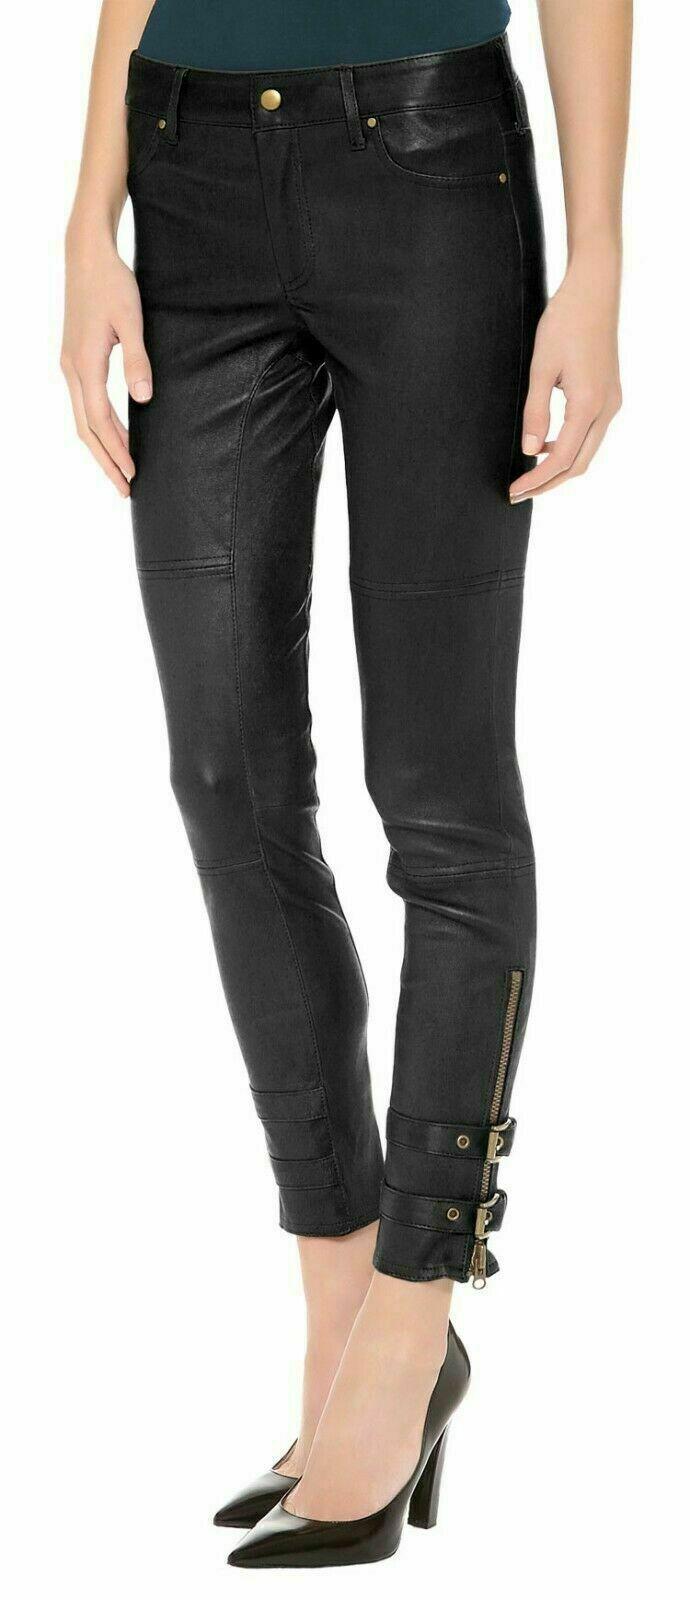 100% Lammleder Damen Black Denim Schmal Hose Klassisch Jeans Hose